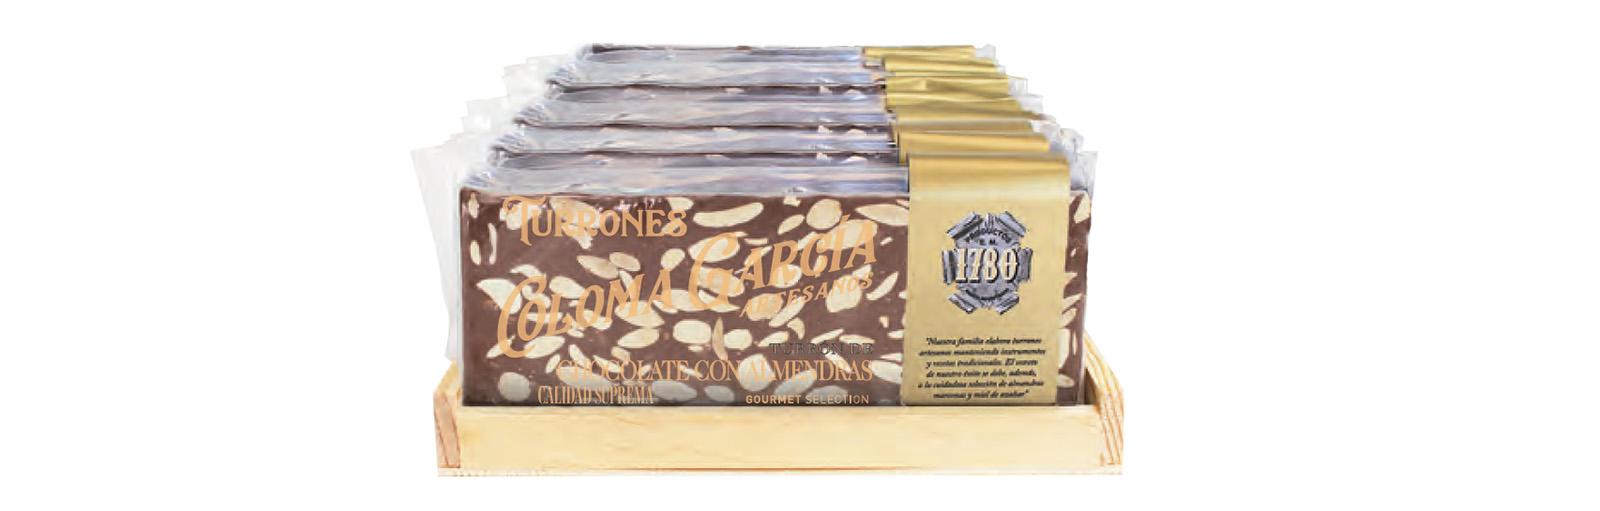 turron-de-chocolate-con-leche-rilsan-200